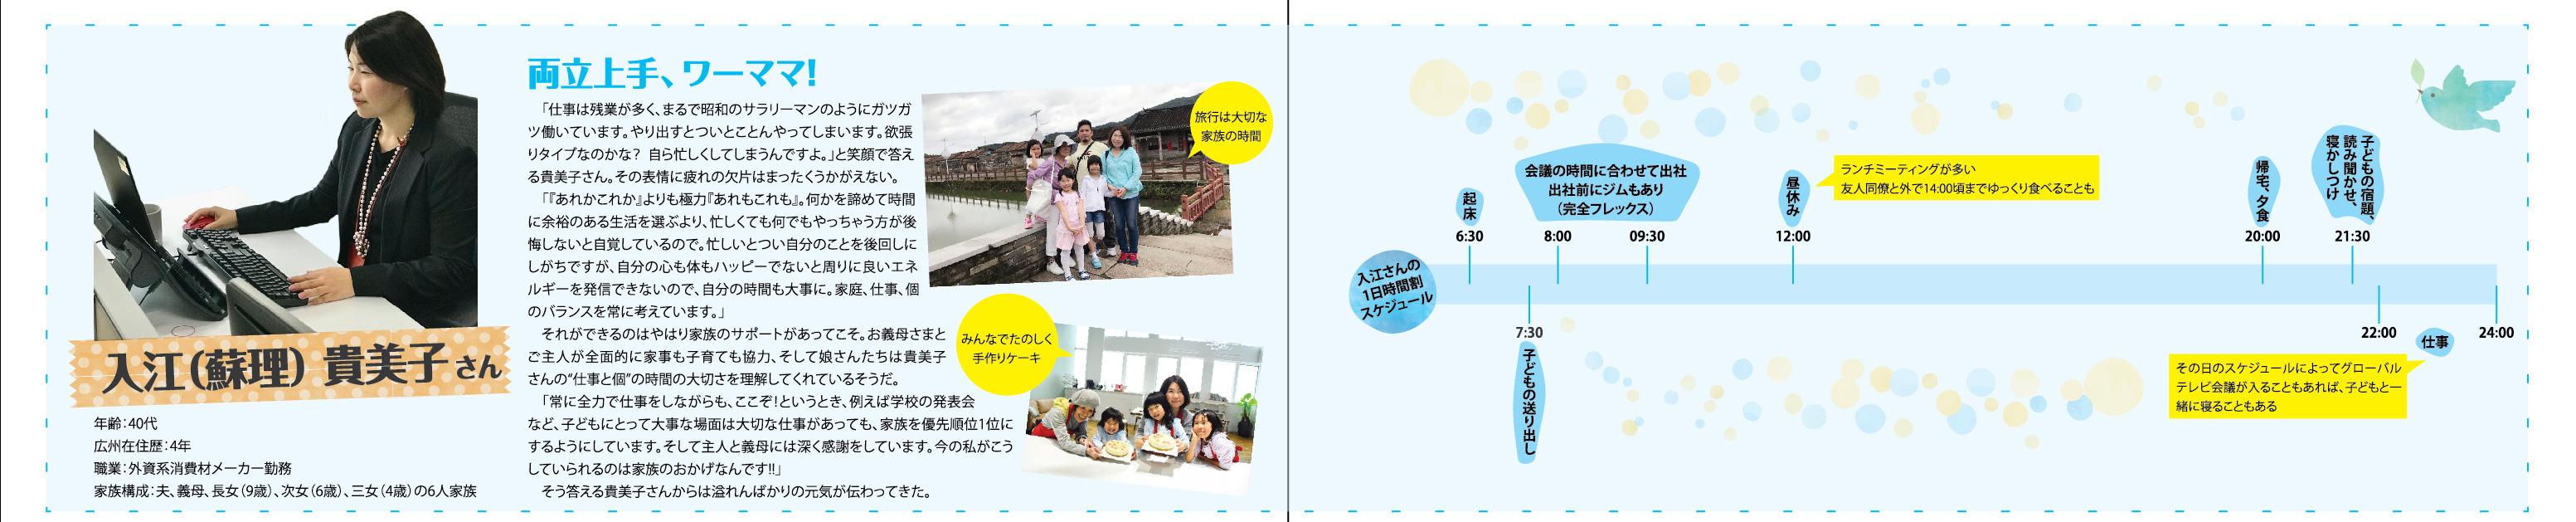 P10-11 mama_647-01 (1)